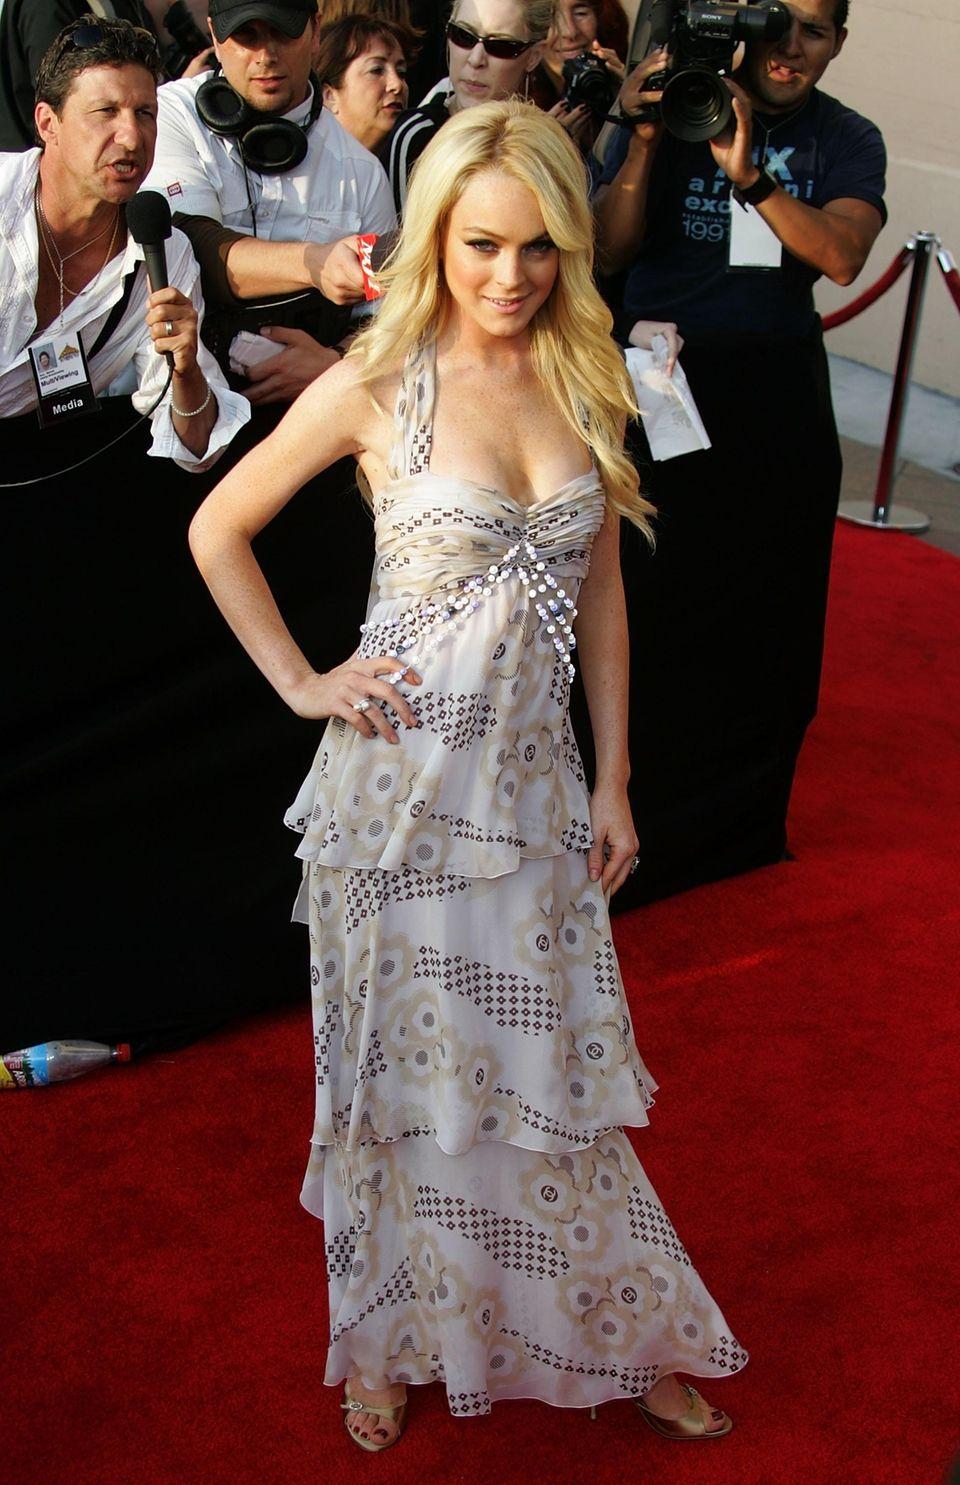 Lindsay Lohan arrives for the MTV Movie Awards